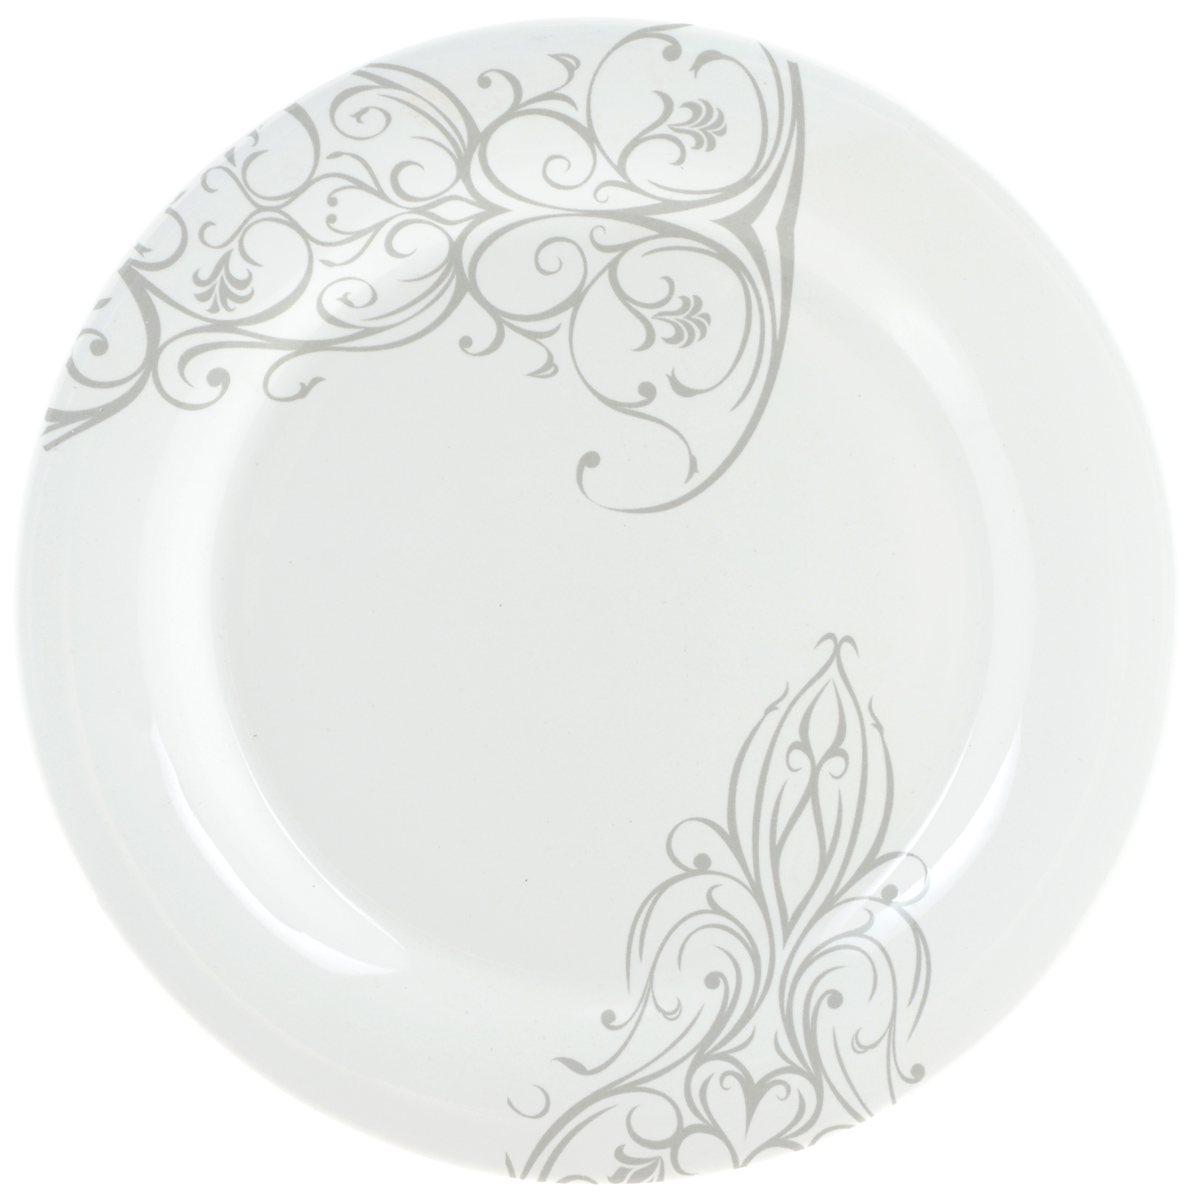 Тарелка десертная Ceramiche Viva Черный ирис, диаметр 20 см тарелка десертная даржилинг оранж 20 5 см 861123